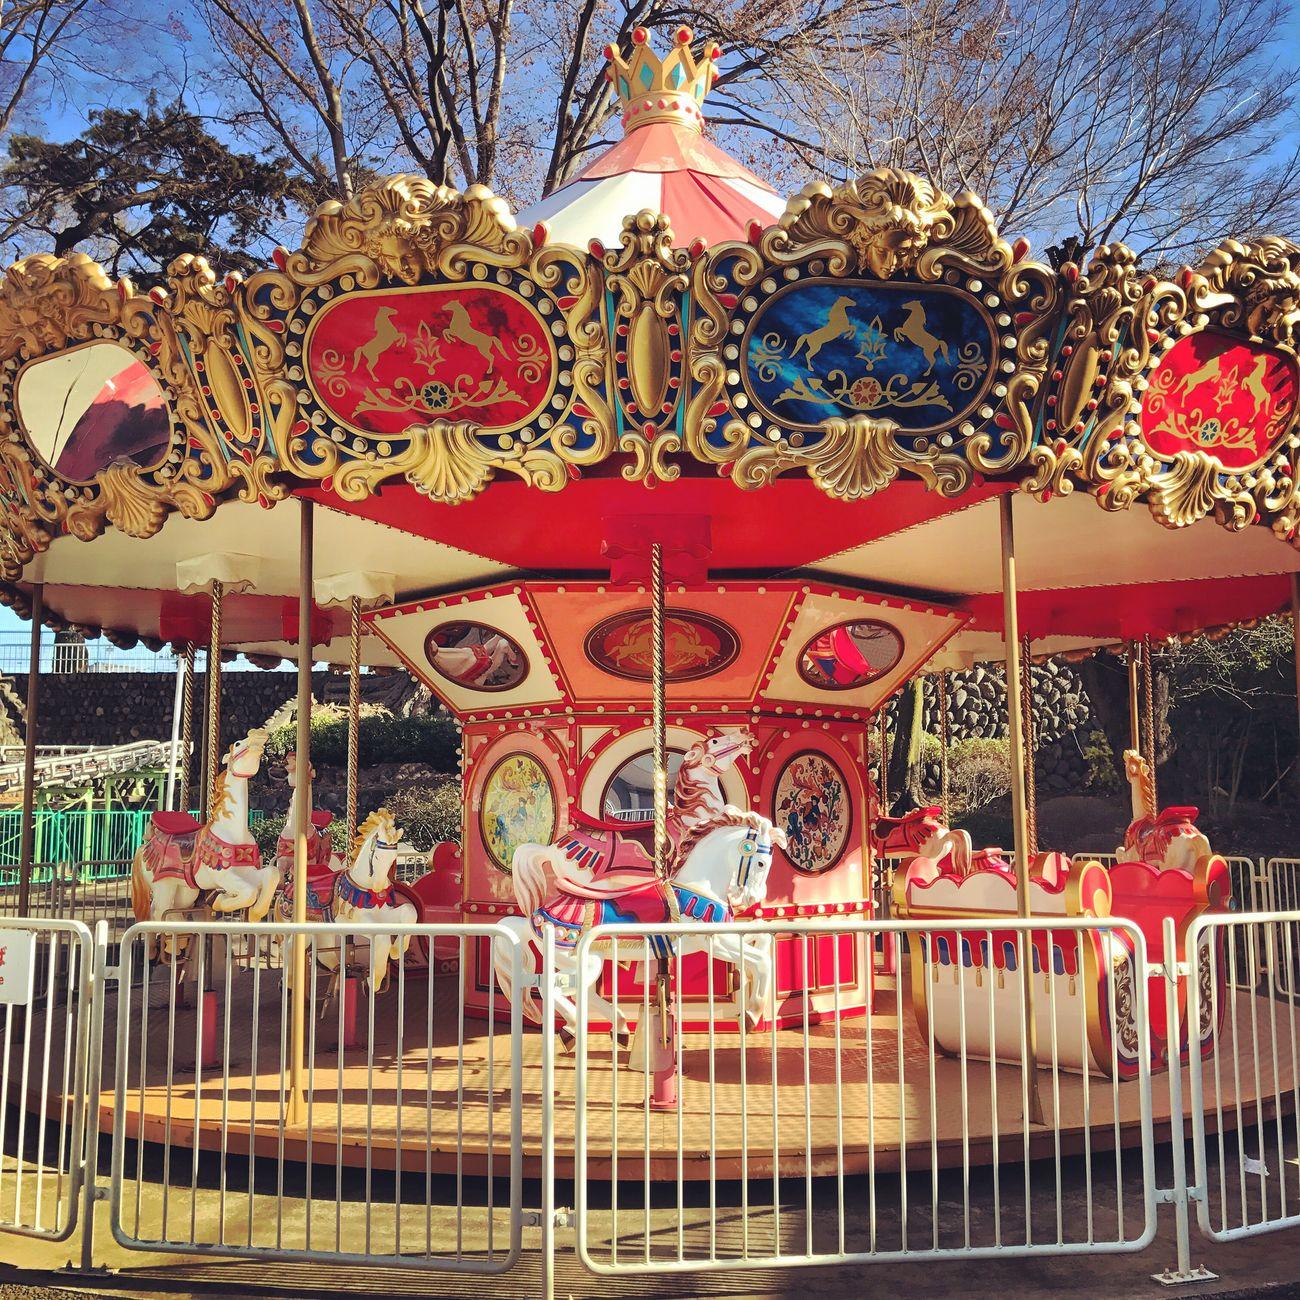 群馬 Walk Amusement Park Merry Go Round